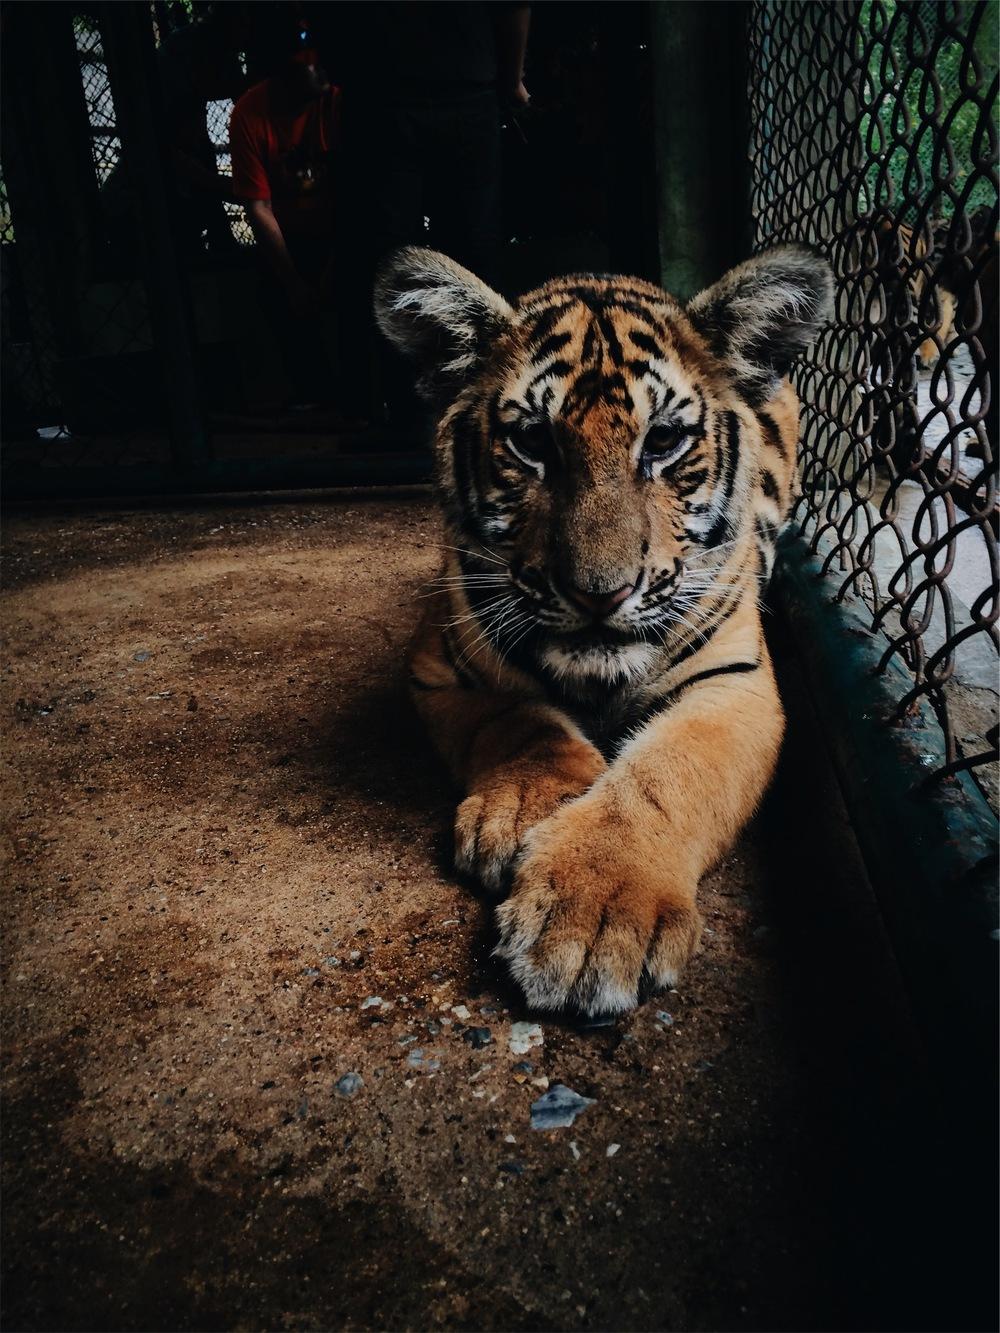 Tiger stock photo.jpeg